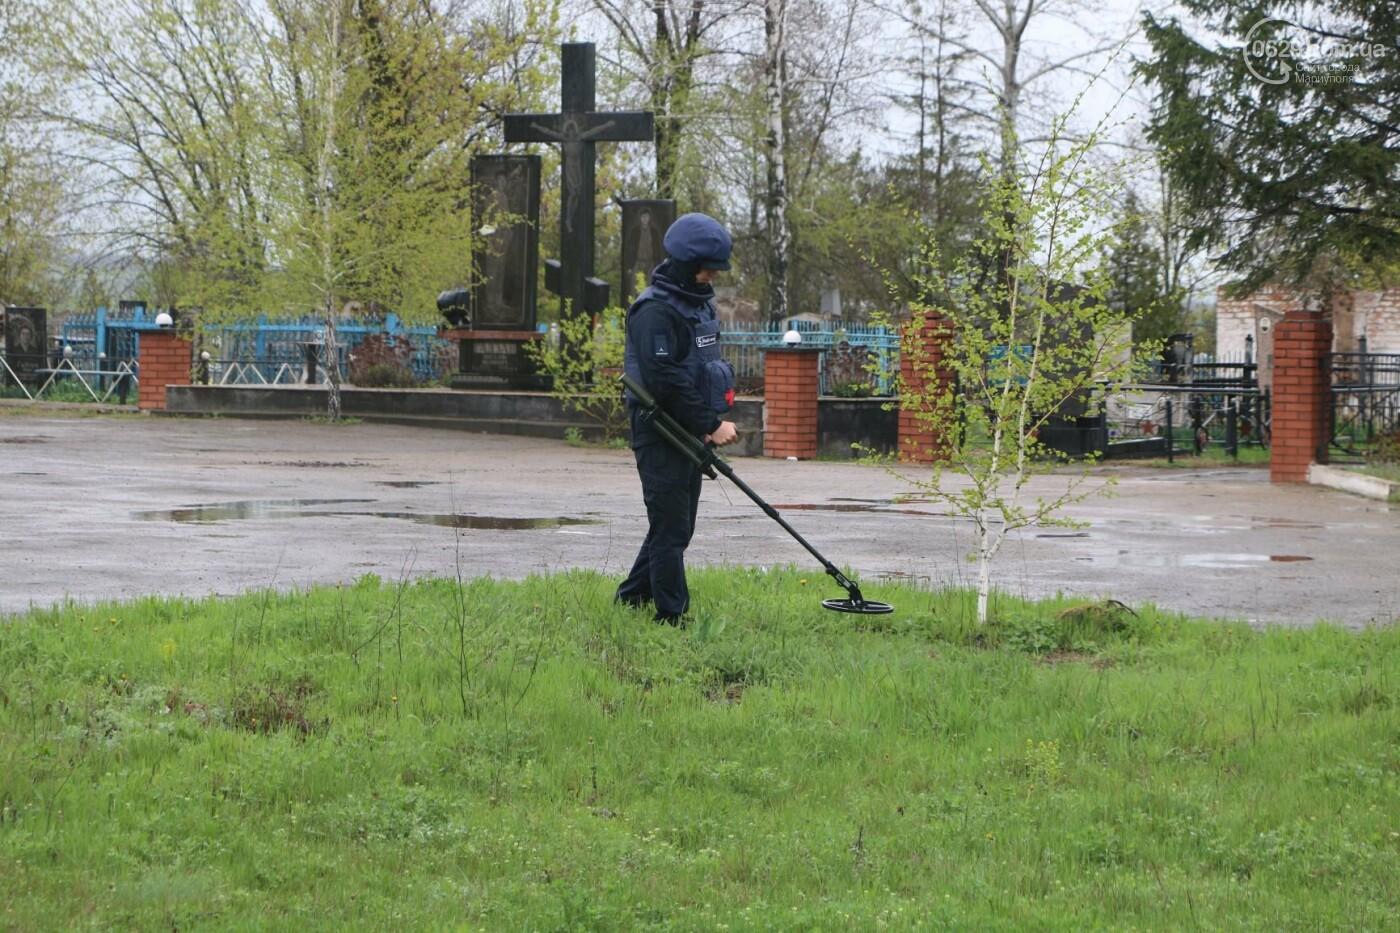 Пиротехники начали проверять безопасность кладбищ Мариуполя,- ФОТО, ВИДЕО, фото-5